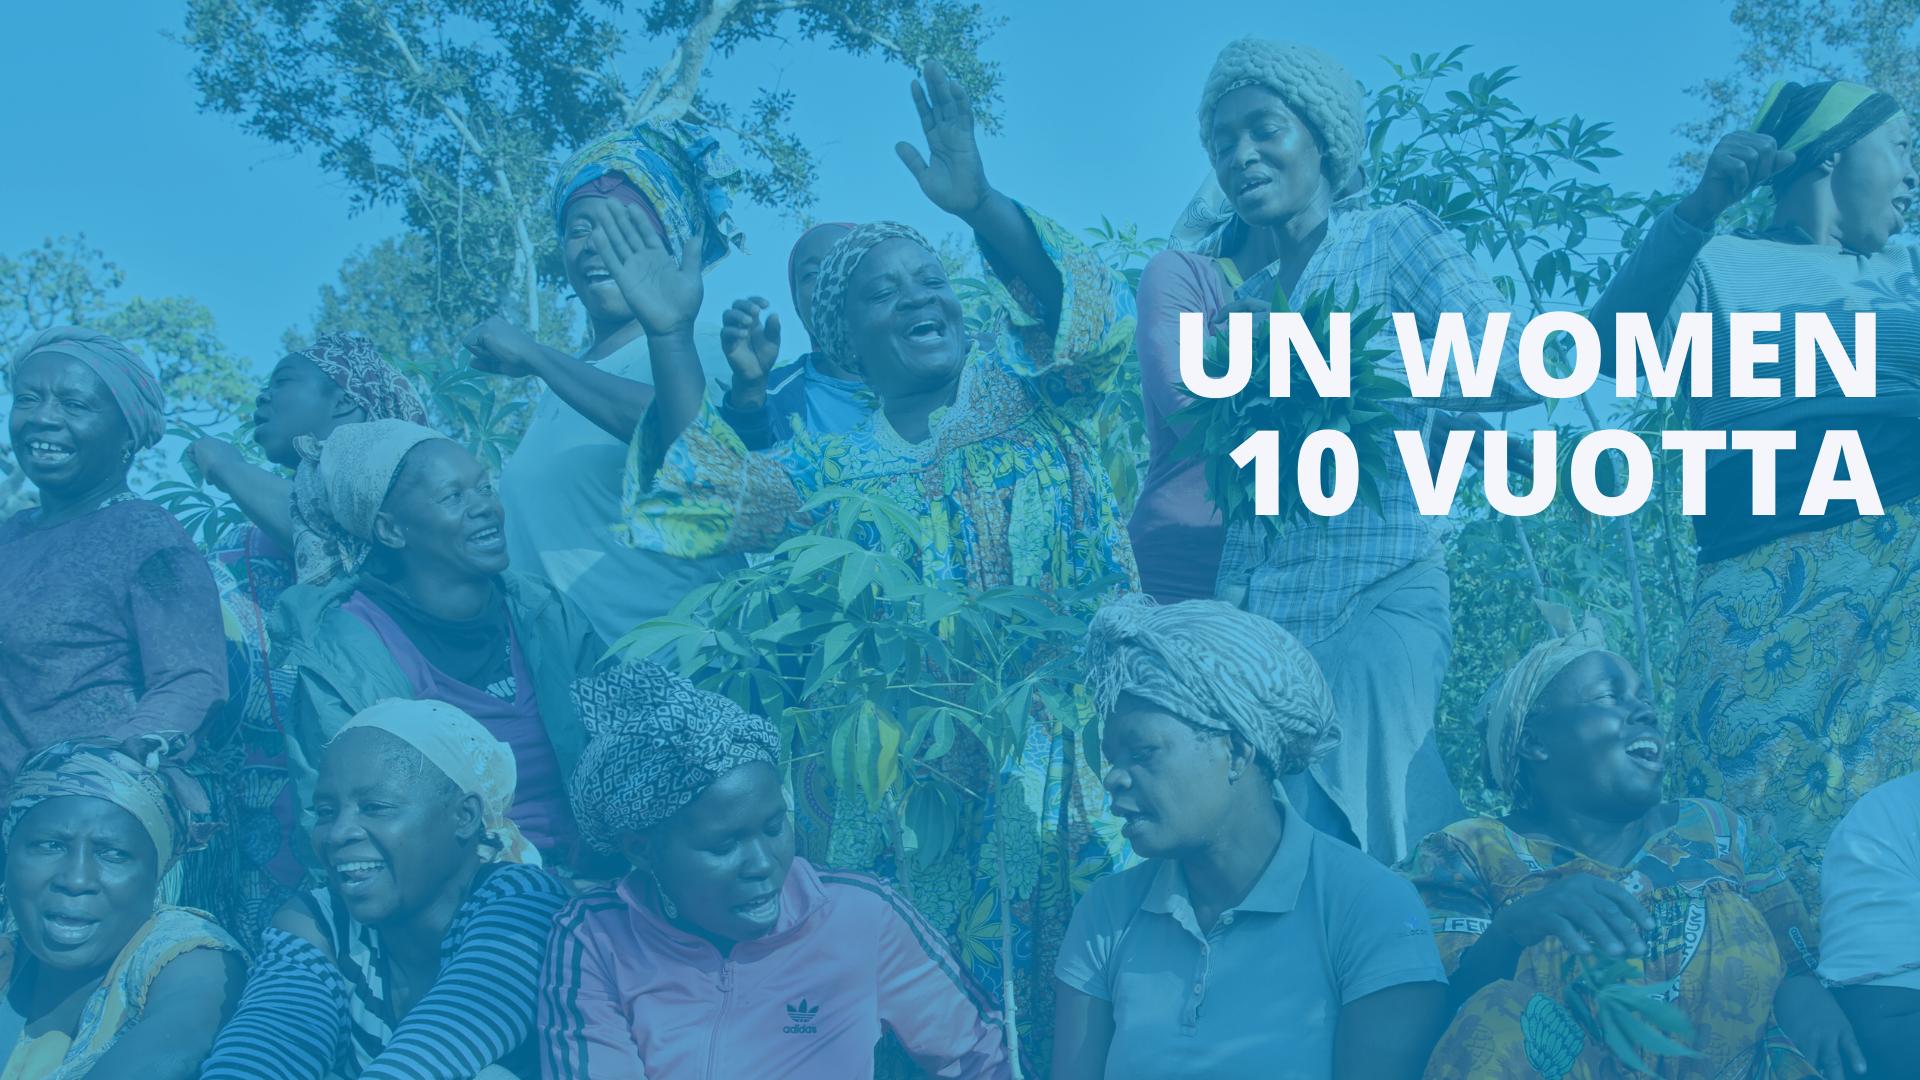 UN Women 10 vuotta